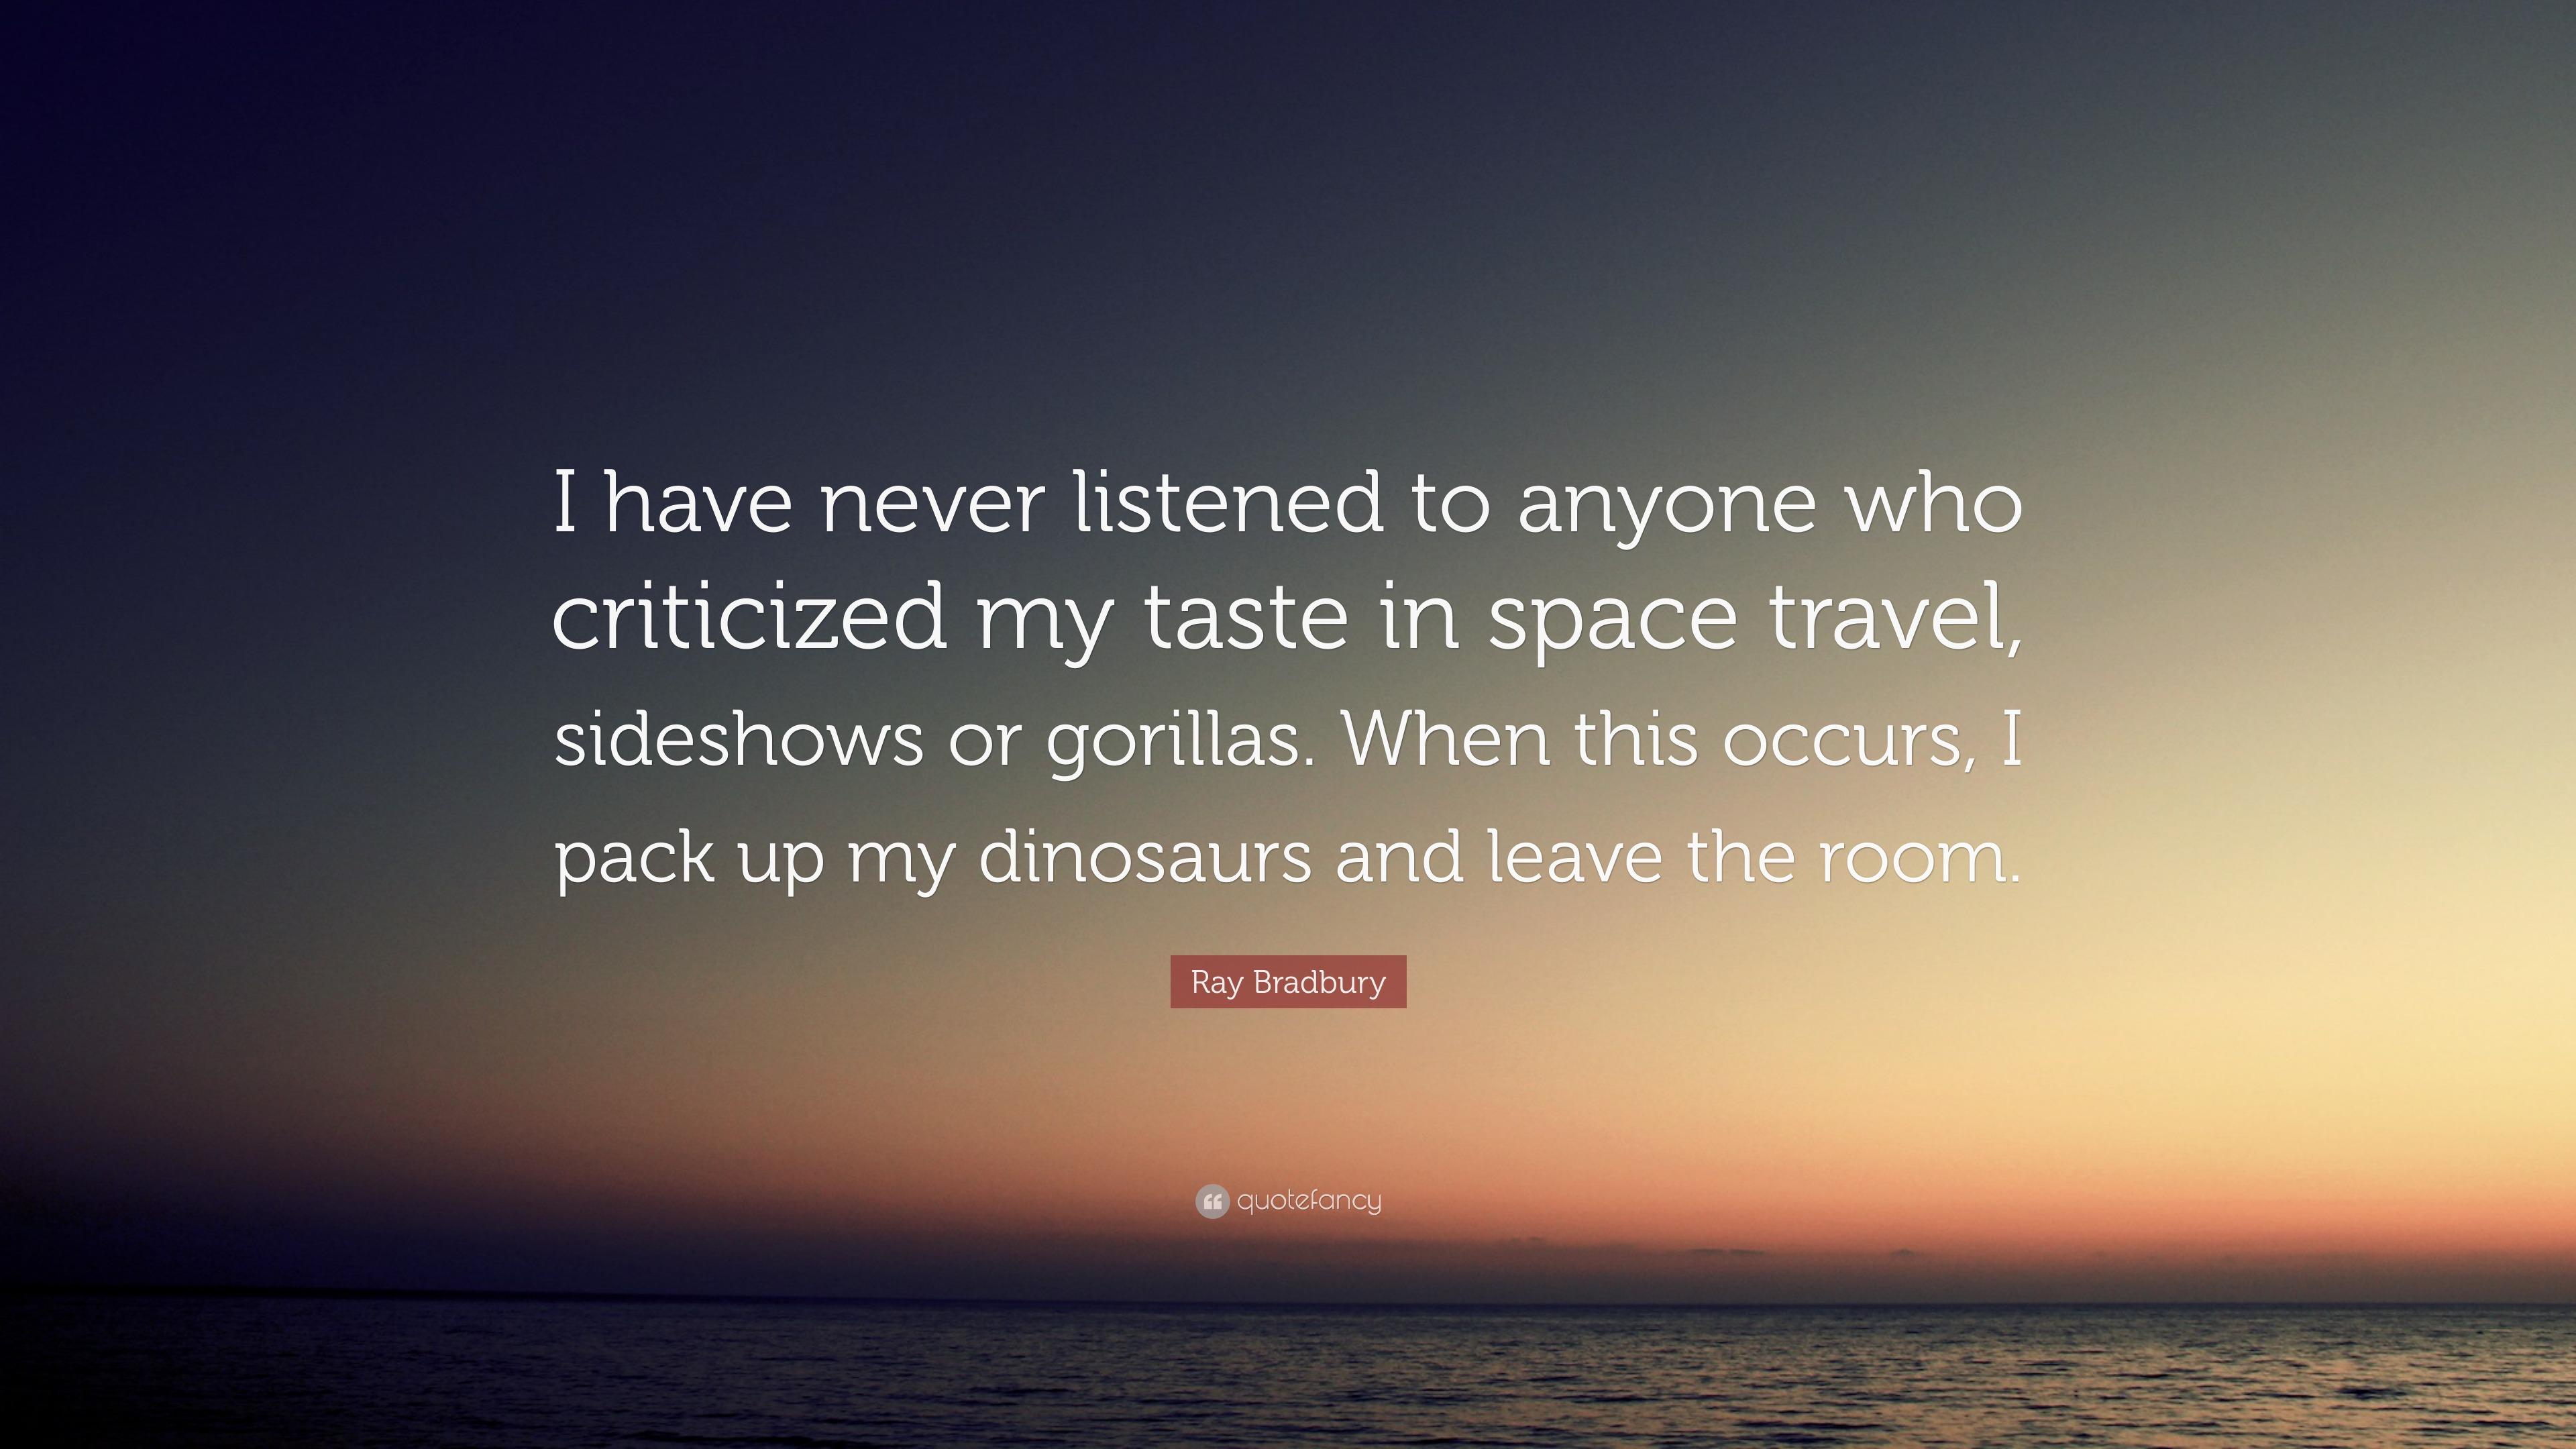 Ray Bradbury Quote I Have Never Listened To Anyone Who